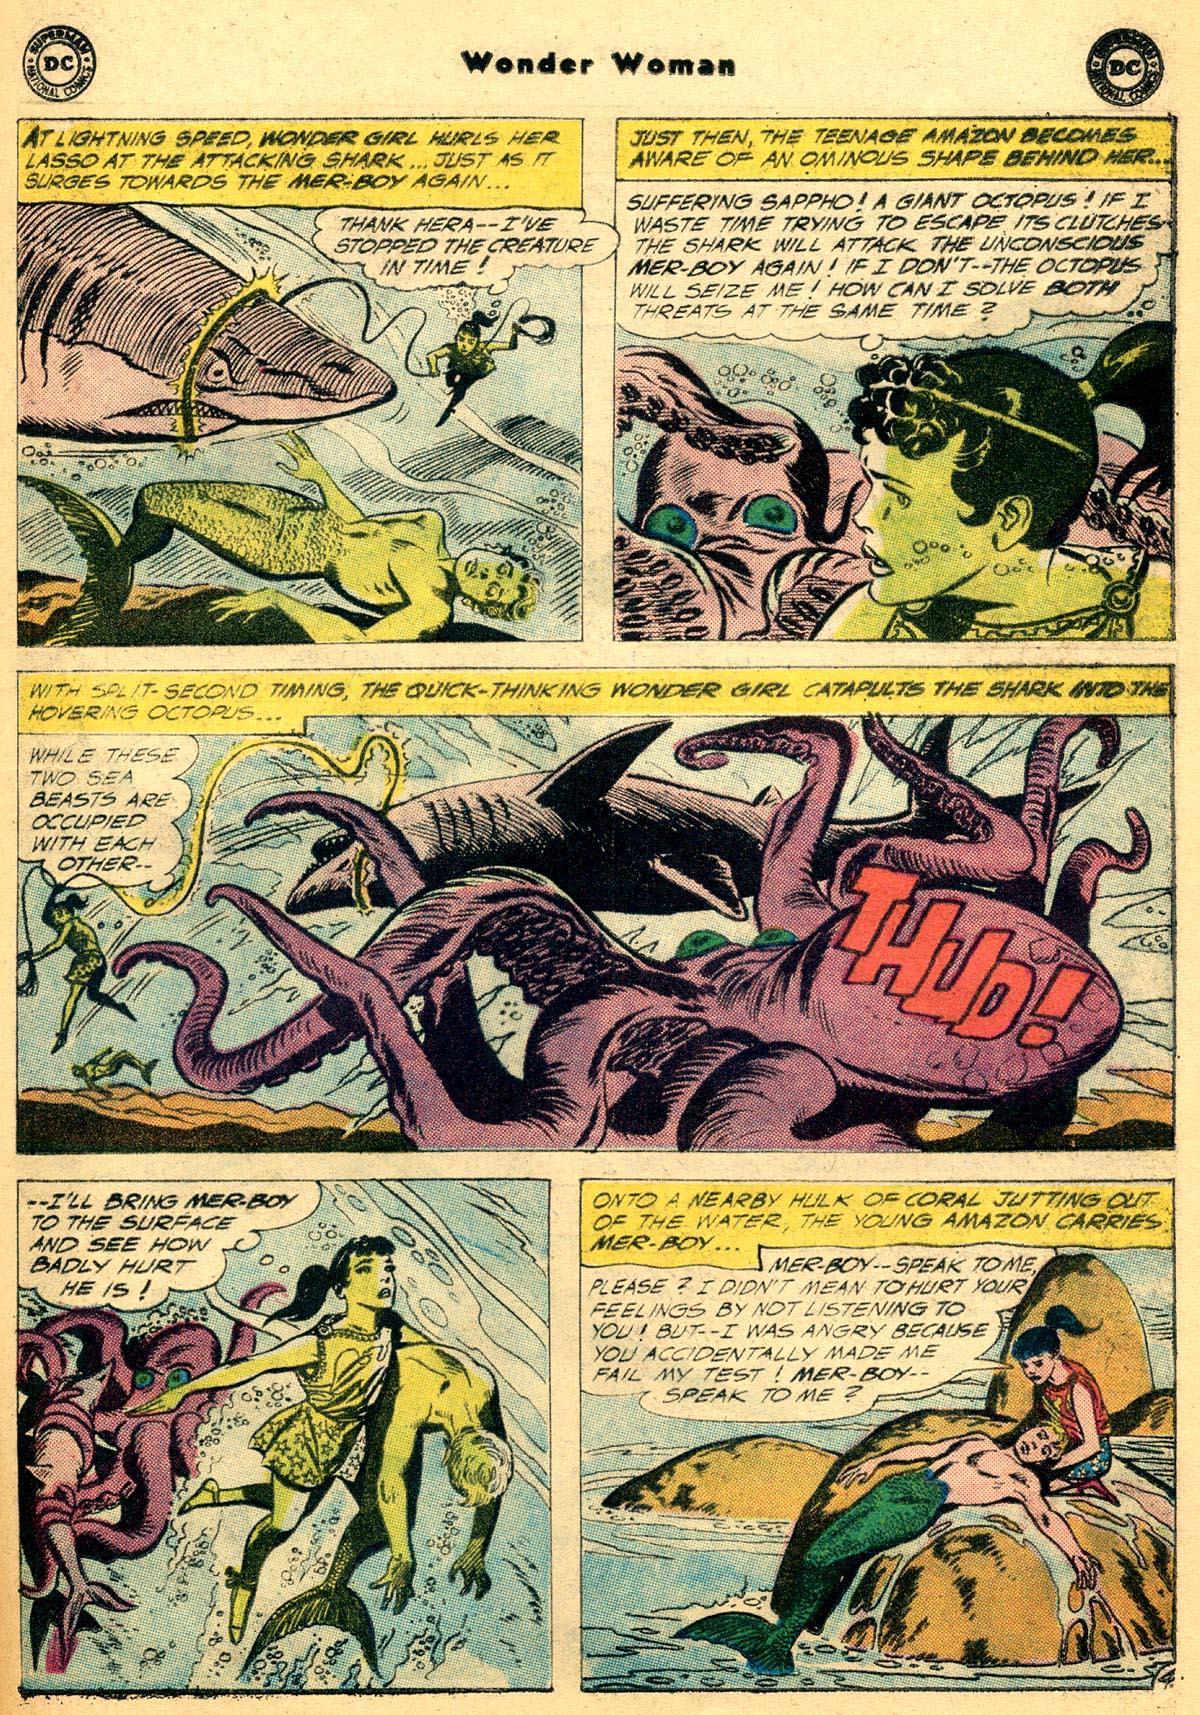 Read online Wonder Woman (1942) comic -  Issue #115 - 21